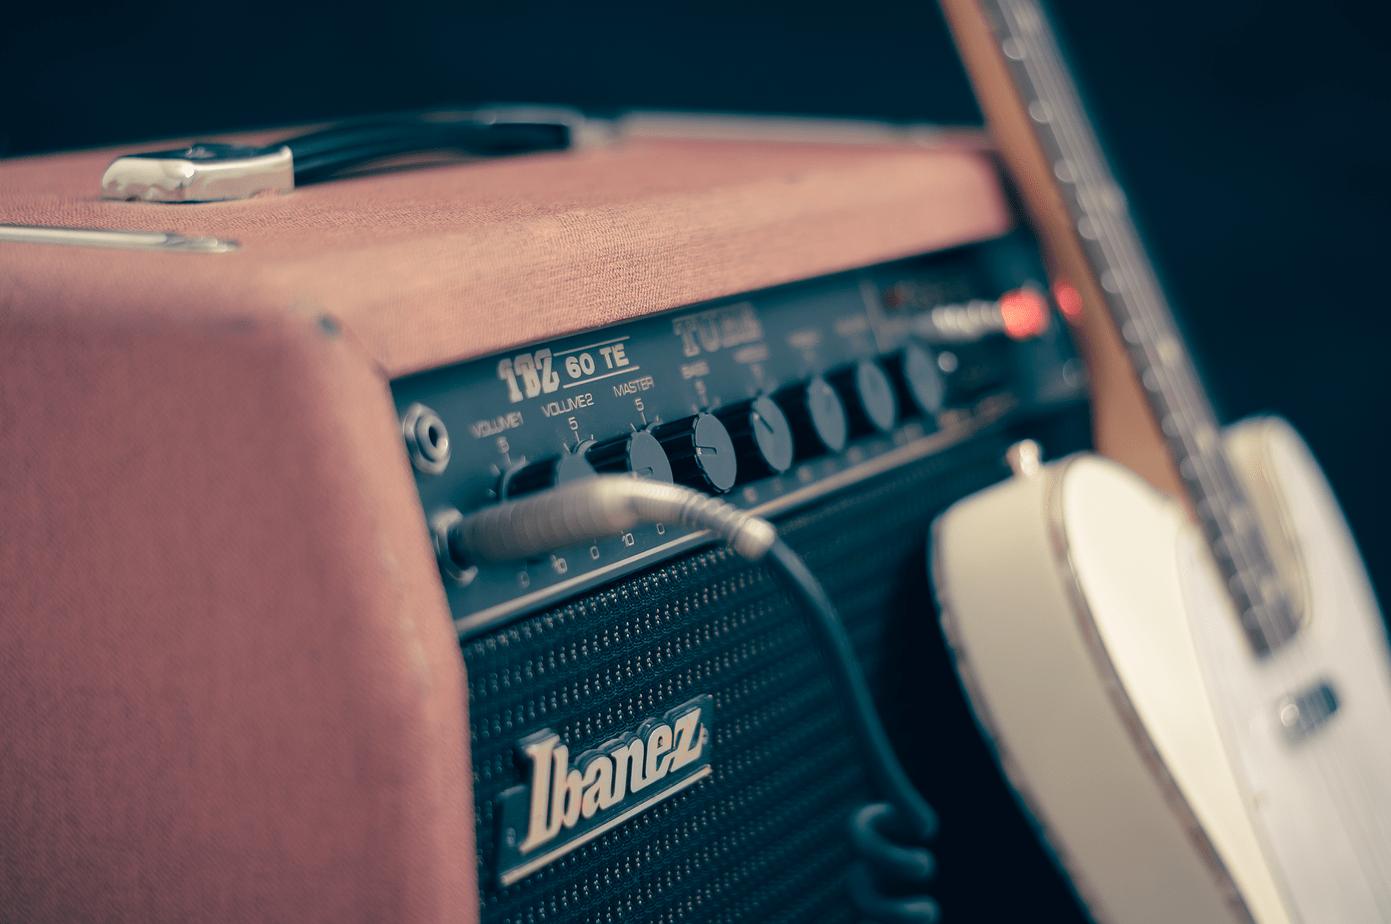 Ibanez SR300 Fretless Electric Bass Guitar Review